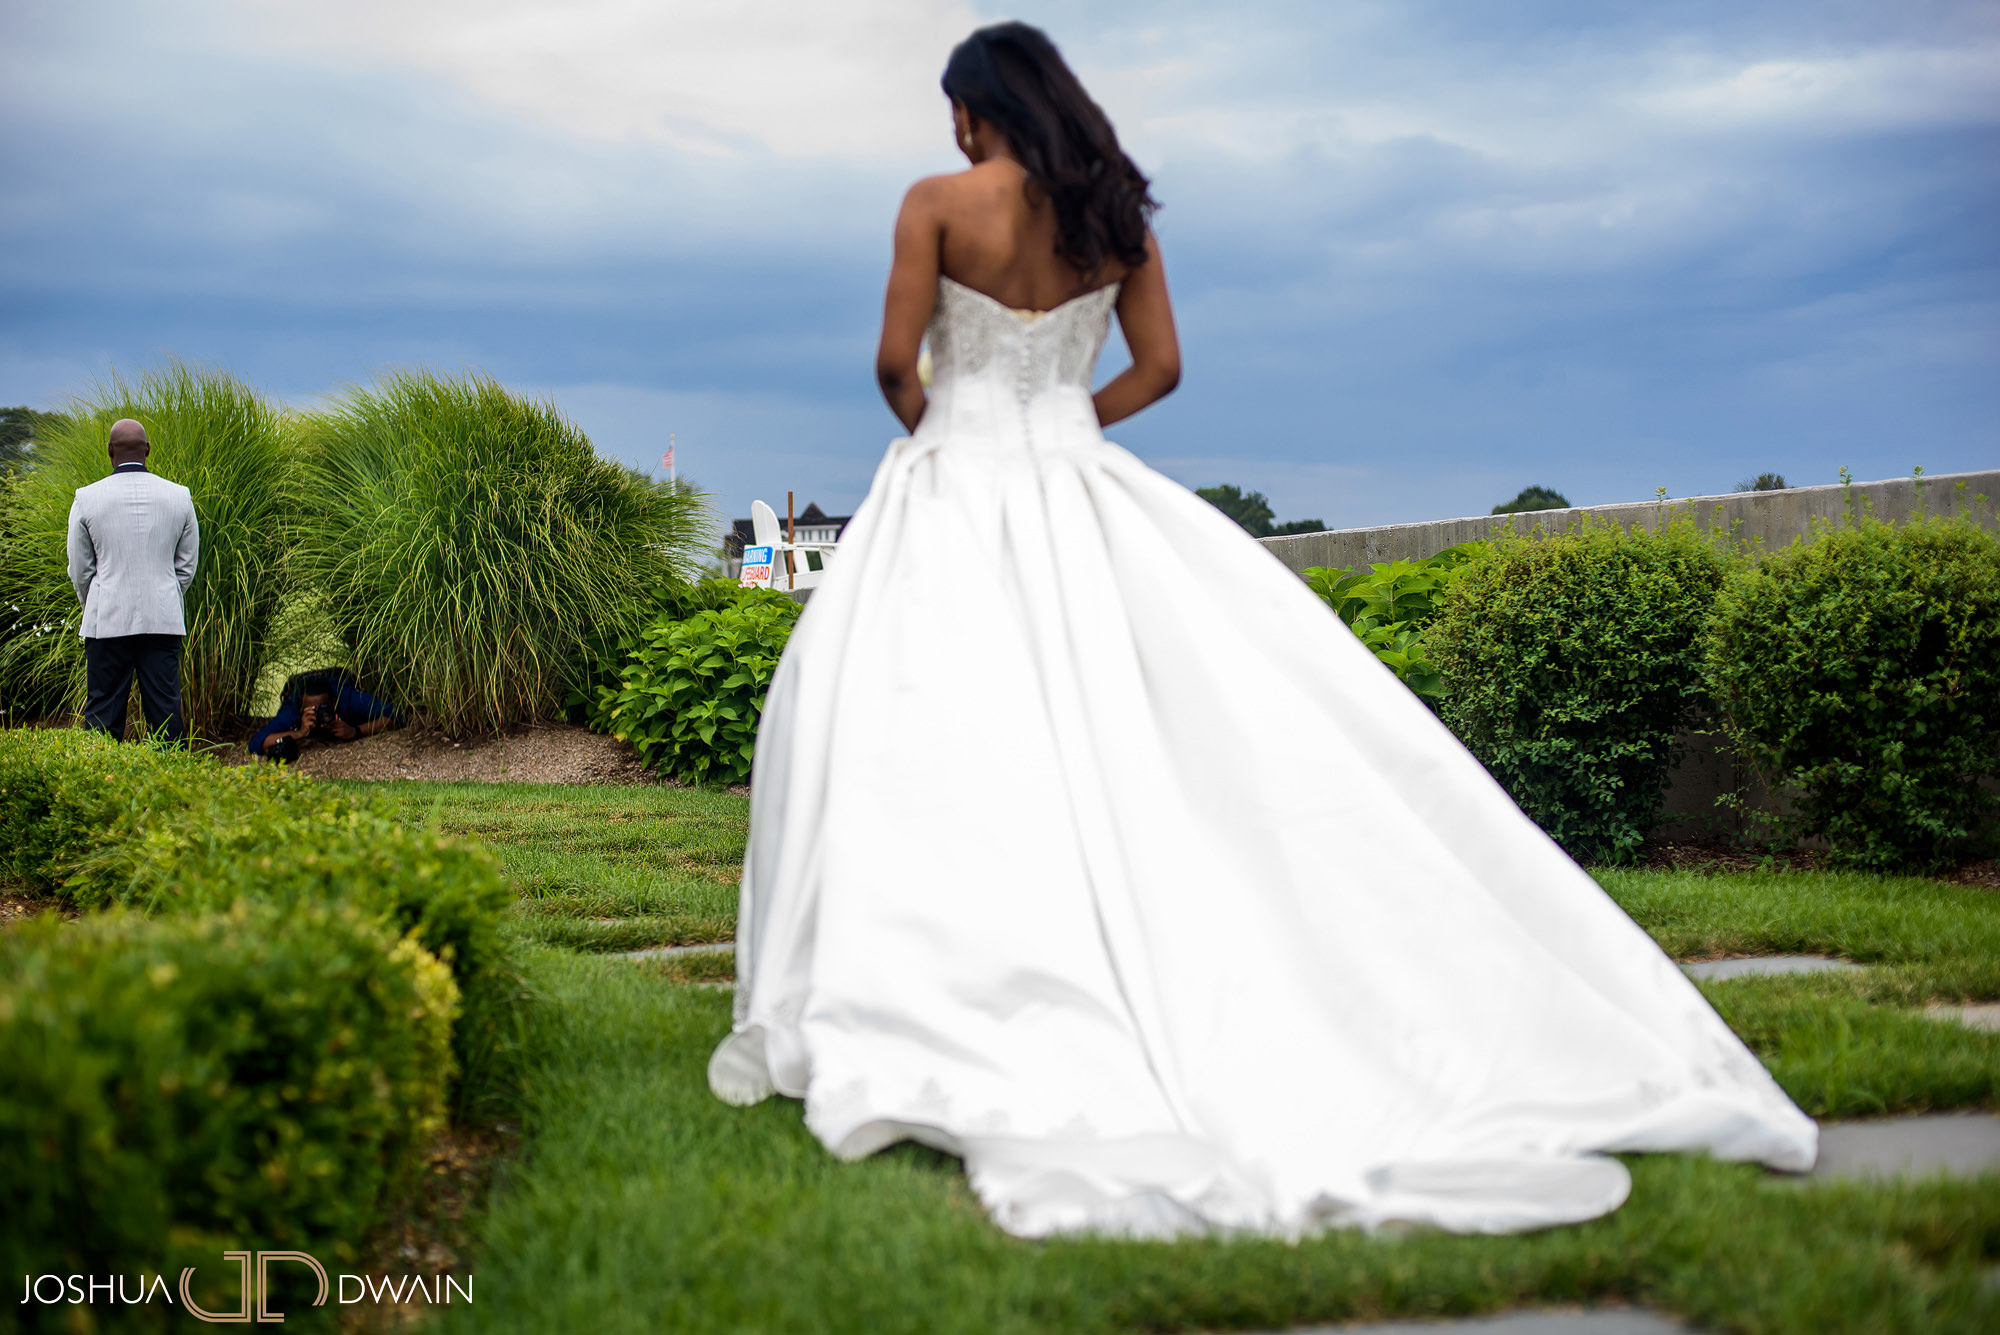 victorious-events-nyc-013-alana-vibert-greentree-country-club-wedding-joshua-dwain.jpg